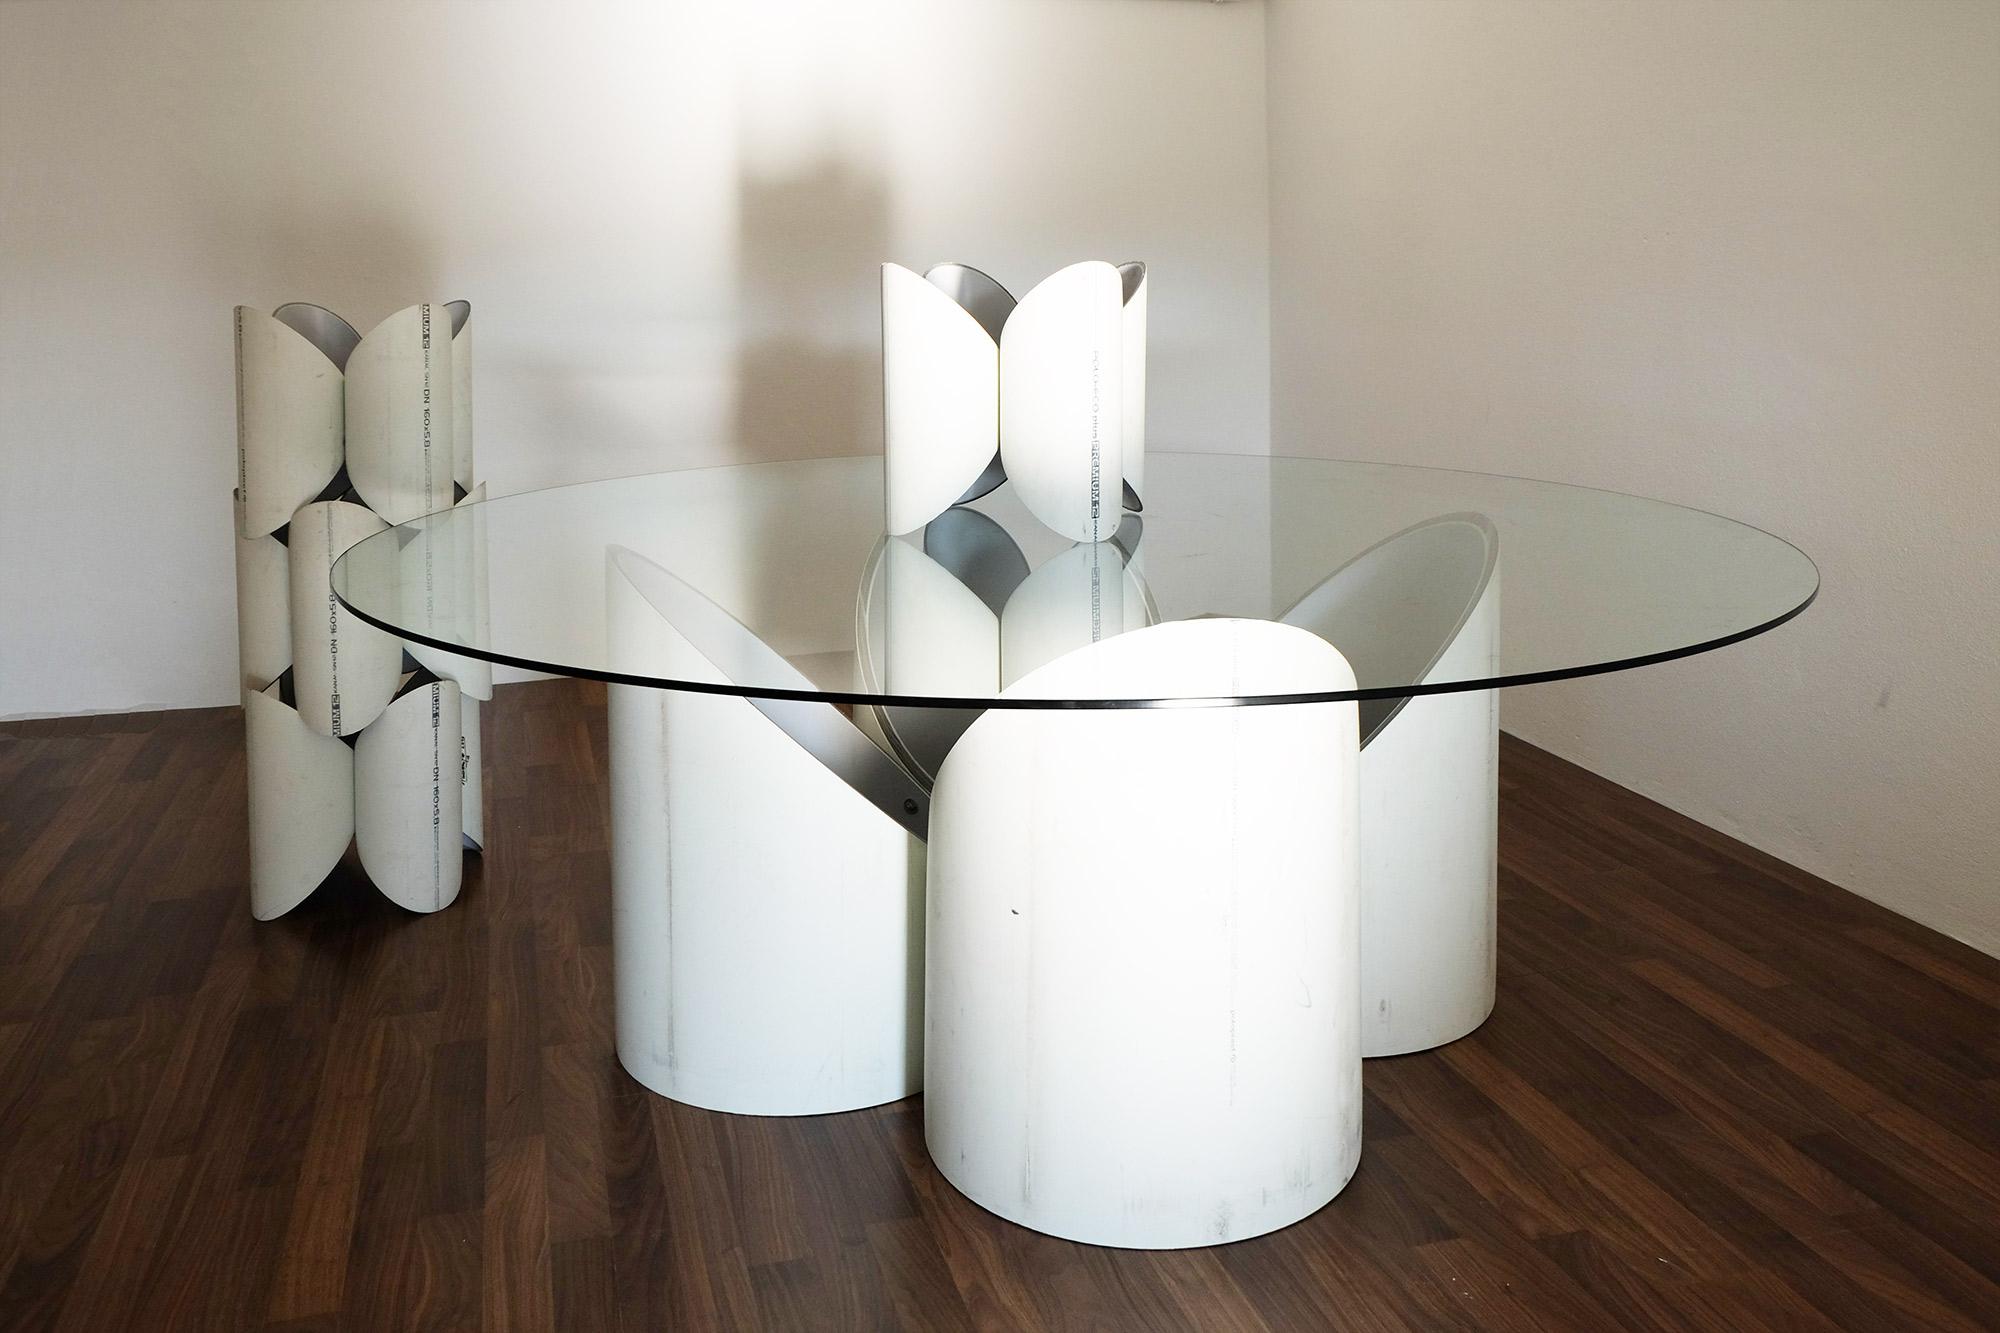 exclusive-furniture-guardian-table-glass-sculpture-statue-contemporary-light-art-design-antique-fine-art-manfred-kili-kielnhofer-7770y